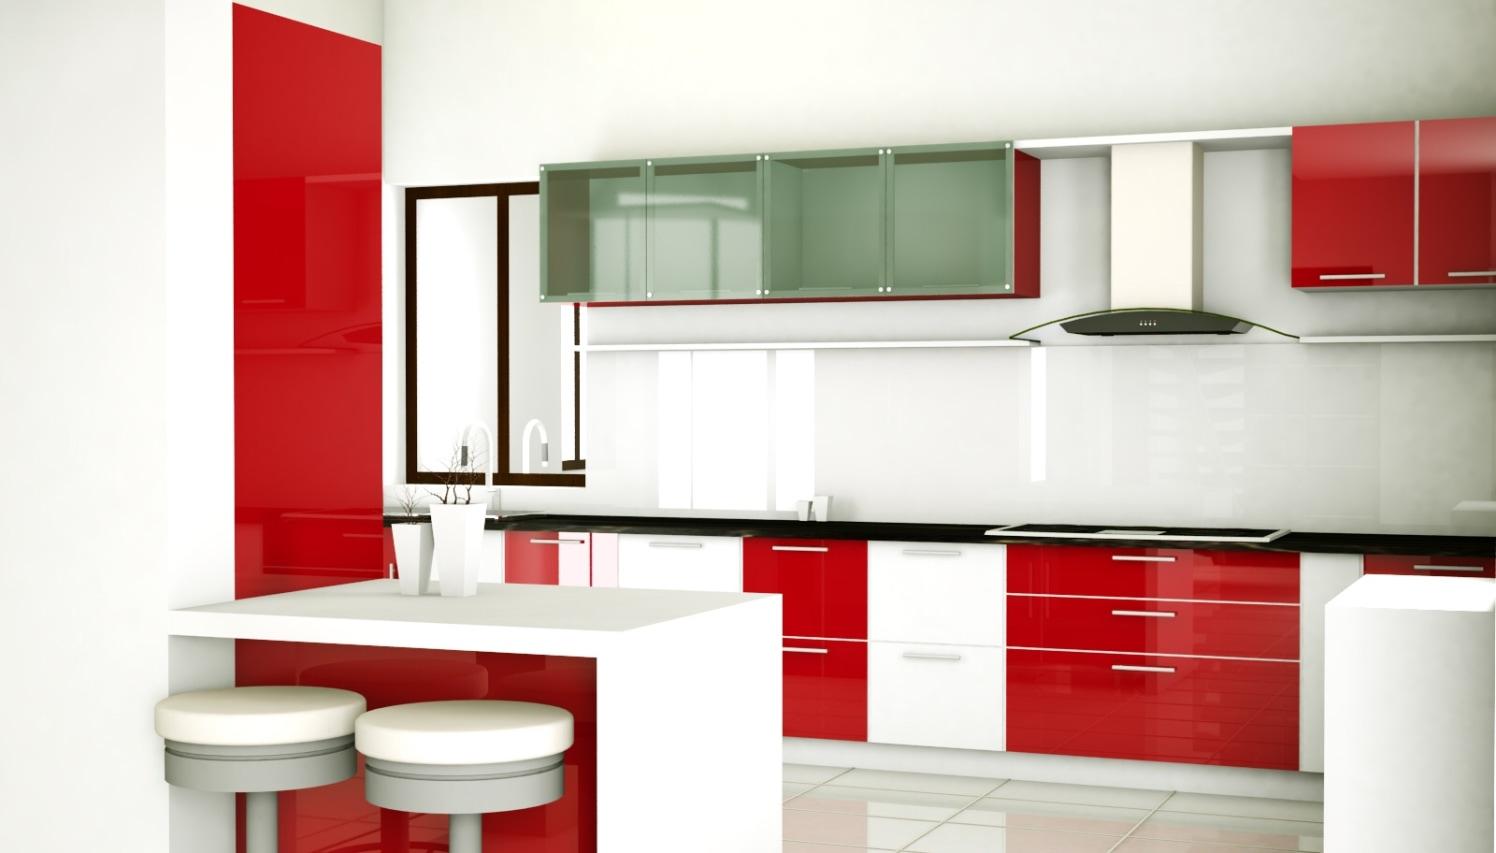 Peninsular Modular Kitchen by entrepreneur Modular-kitchen Modern | Interior Design Photos & Ideas